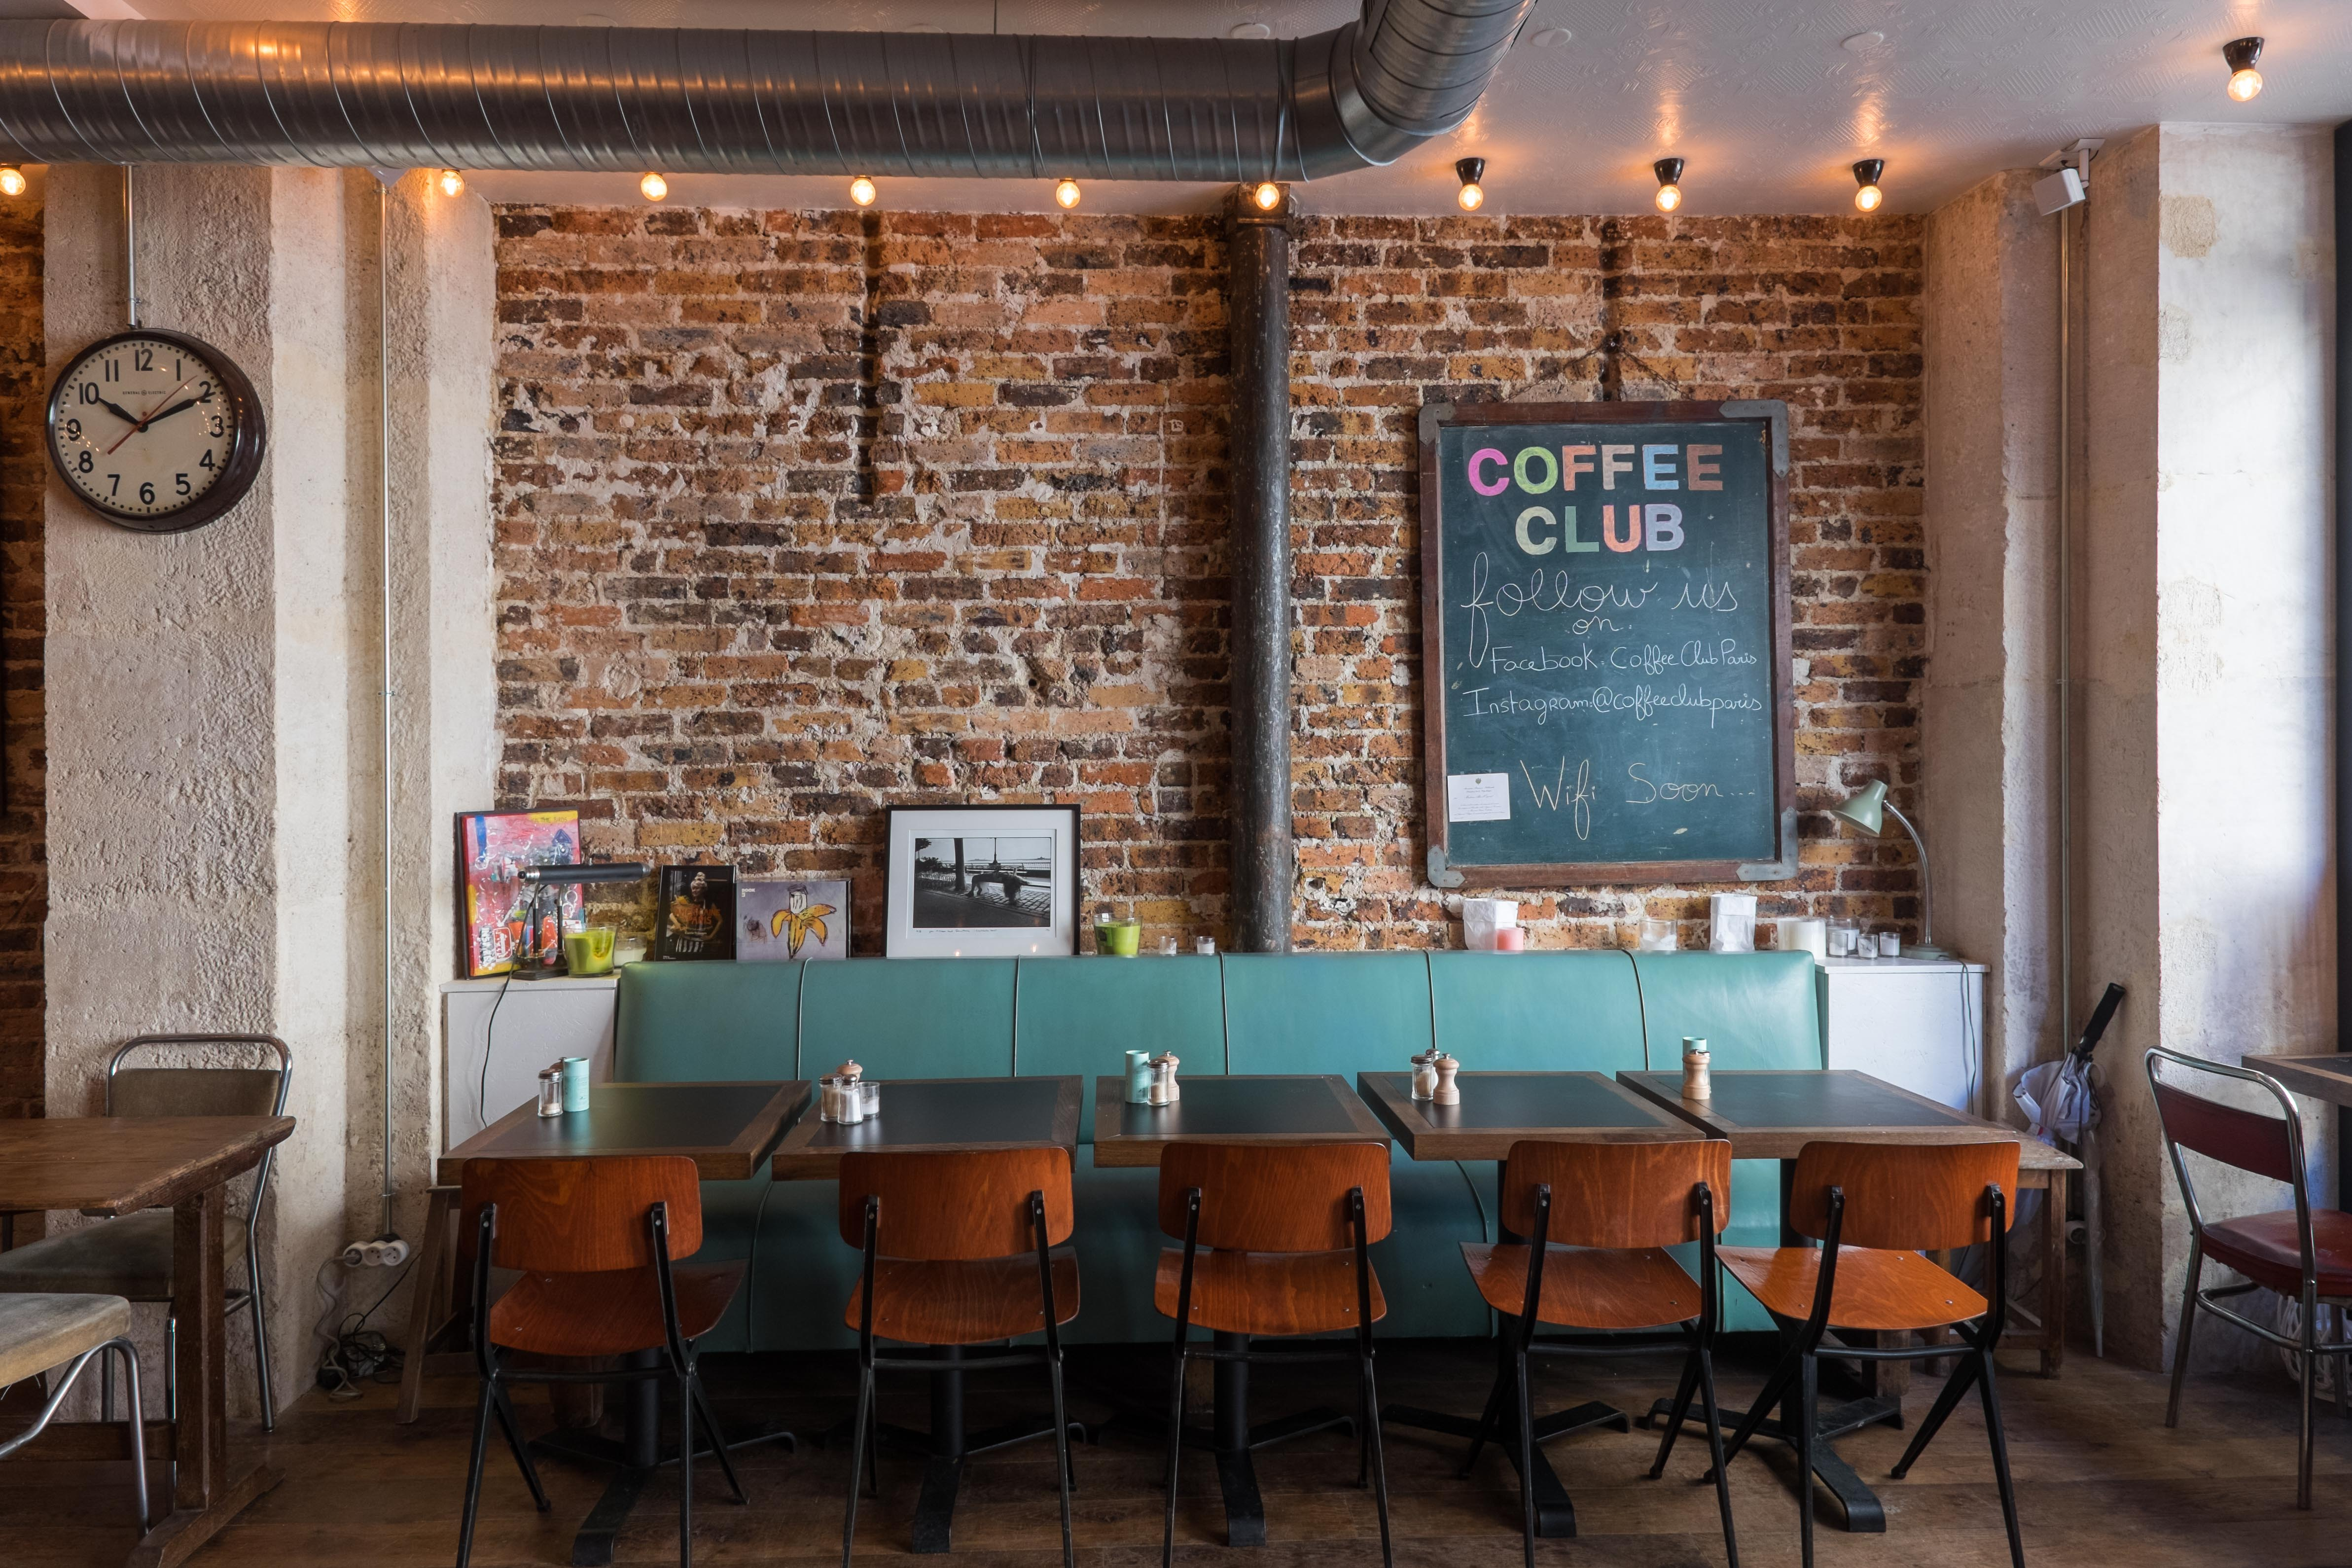 Coffee Club 1 - @C. Rouffio